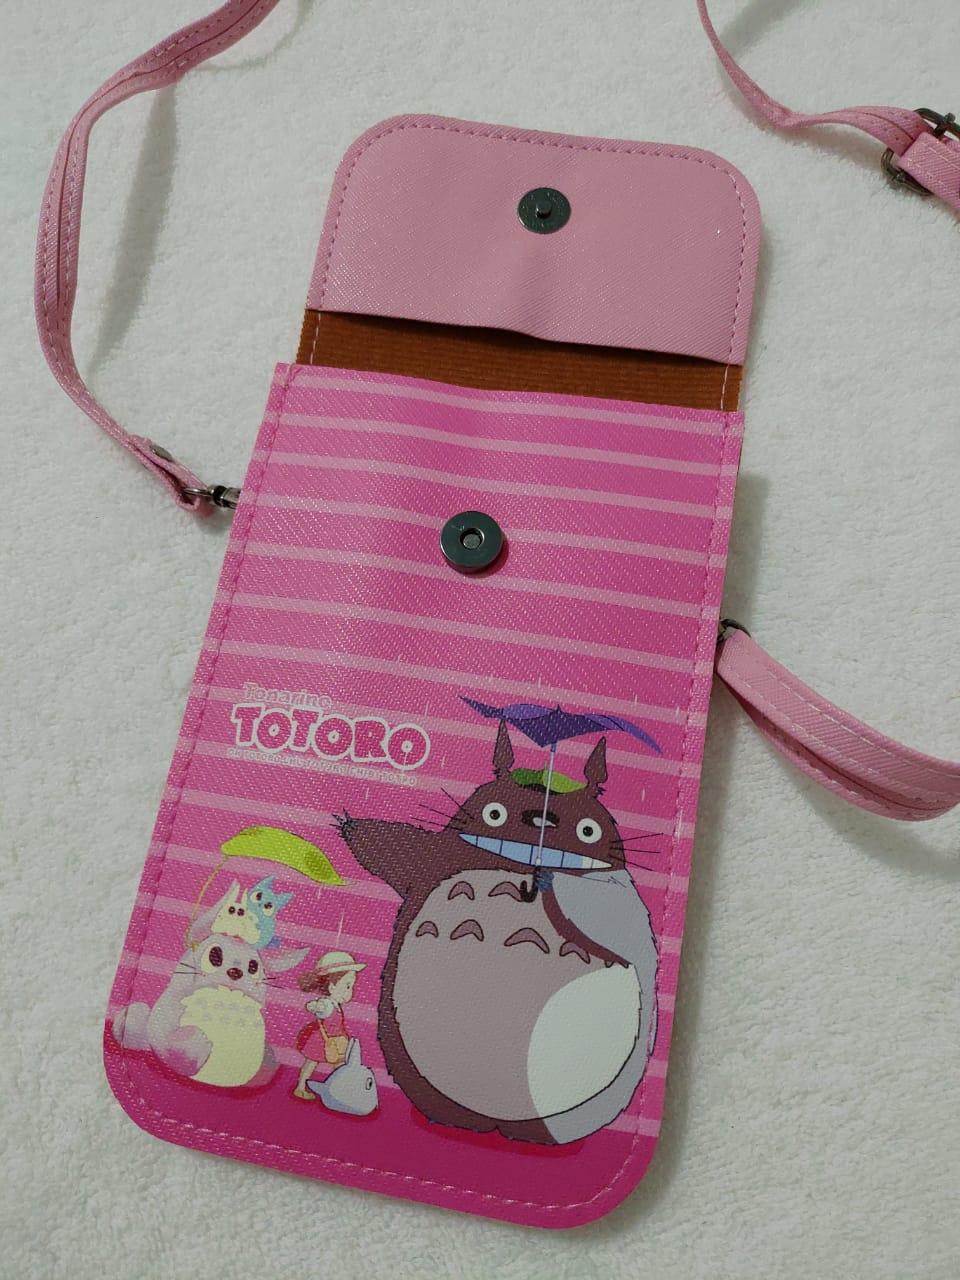 Bolsa com alça Totoro Rosa Material sintético - KL